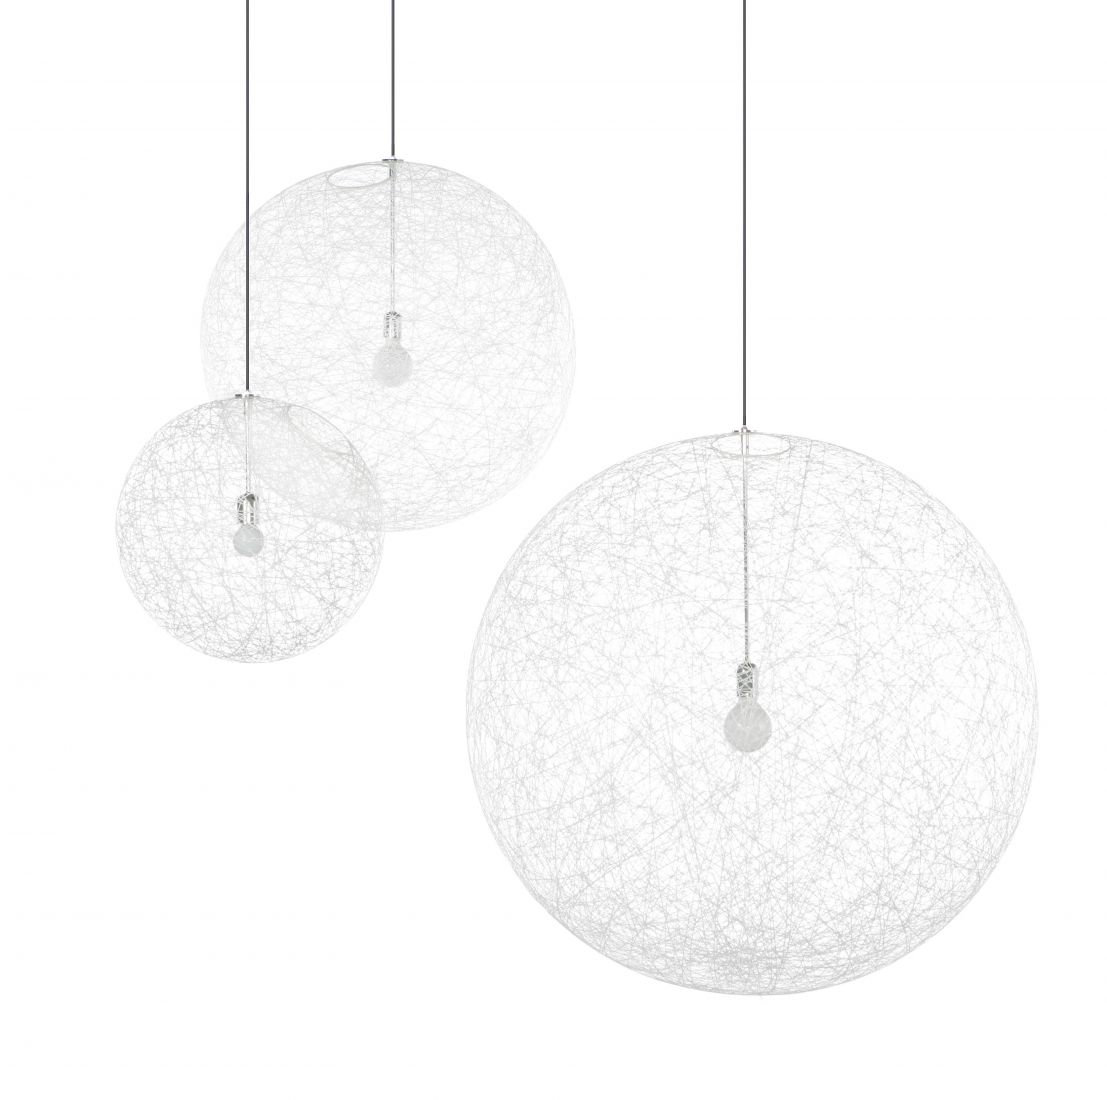 Random light Pendant Lamp Medium ø80cm 1x60w E27 White